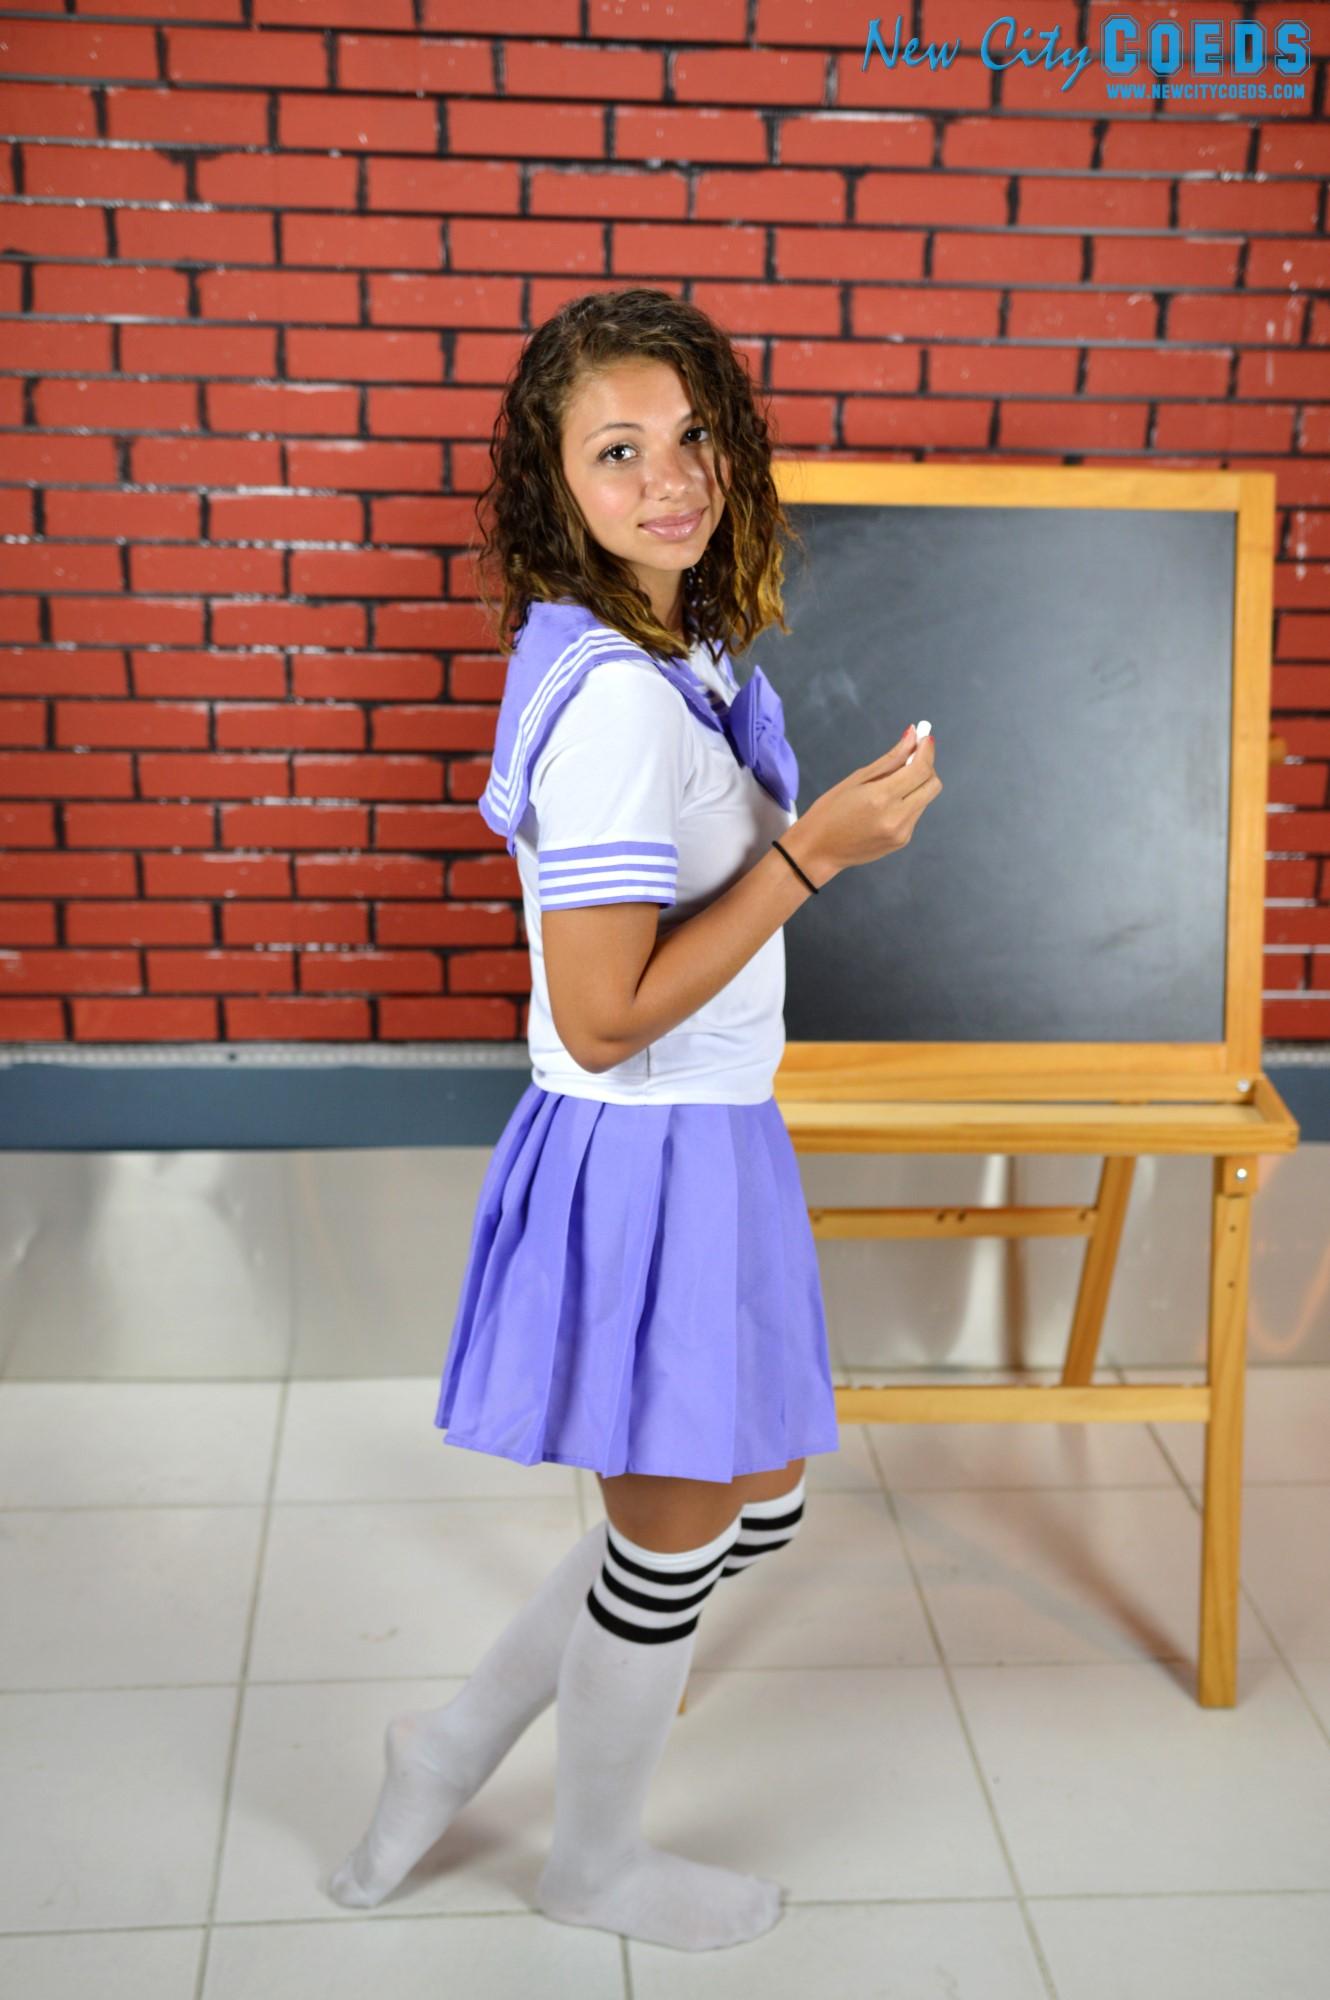 Aubrey Coed Model - Bad School Girl gallery - New City